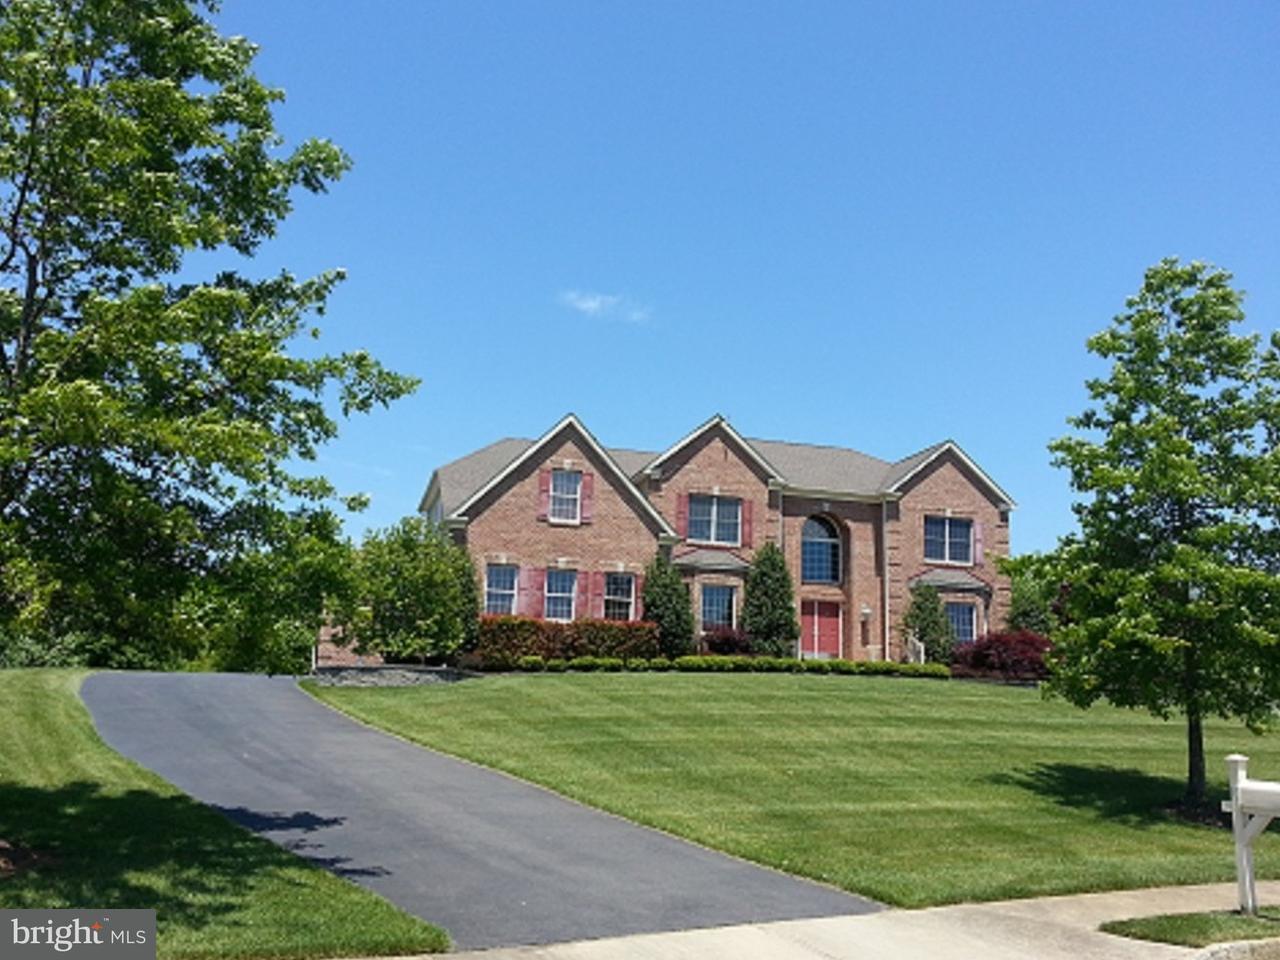 Casa Unifamiliar por un Venta en 12 MASON Drive Cream Ridge, Nueva Jersey 08514 Estados UnidosEn/Alrededor: Upper Freehold Township